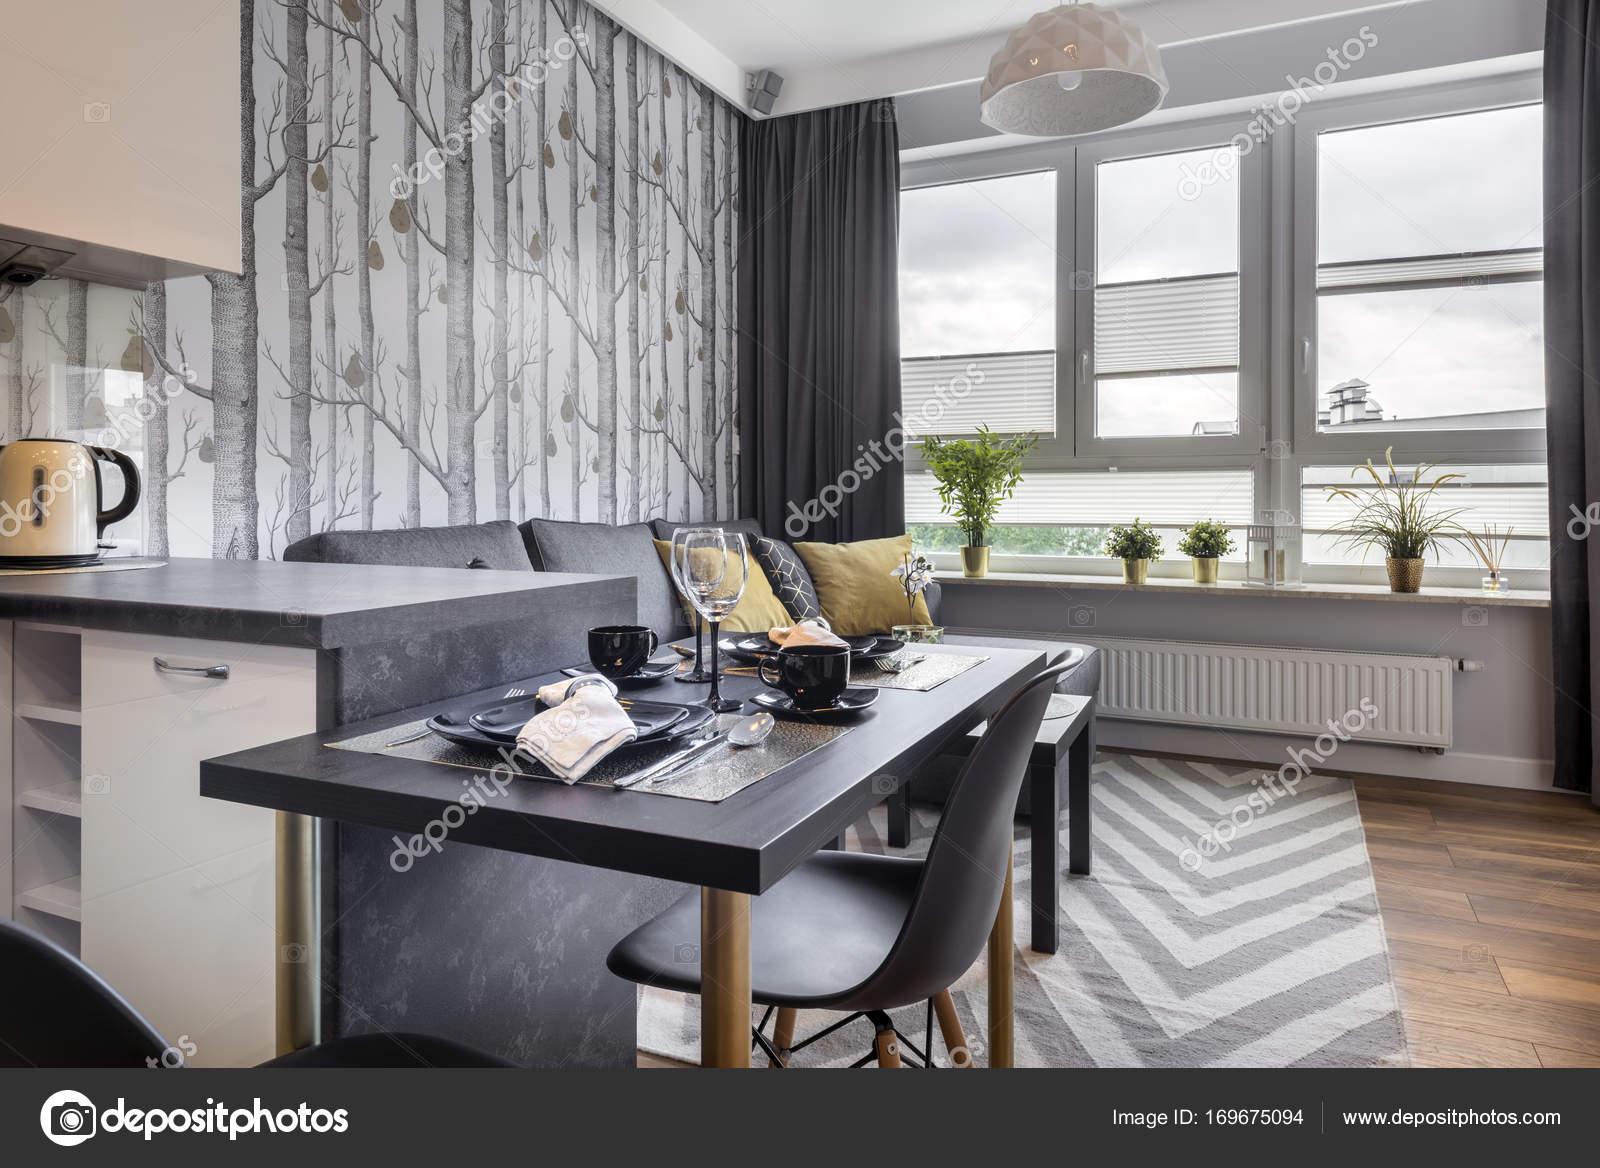 Met Keuken Kleine : Moderne kleine kamer met keuken u stockfoto jacek kadaj